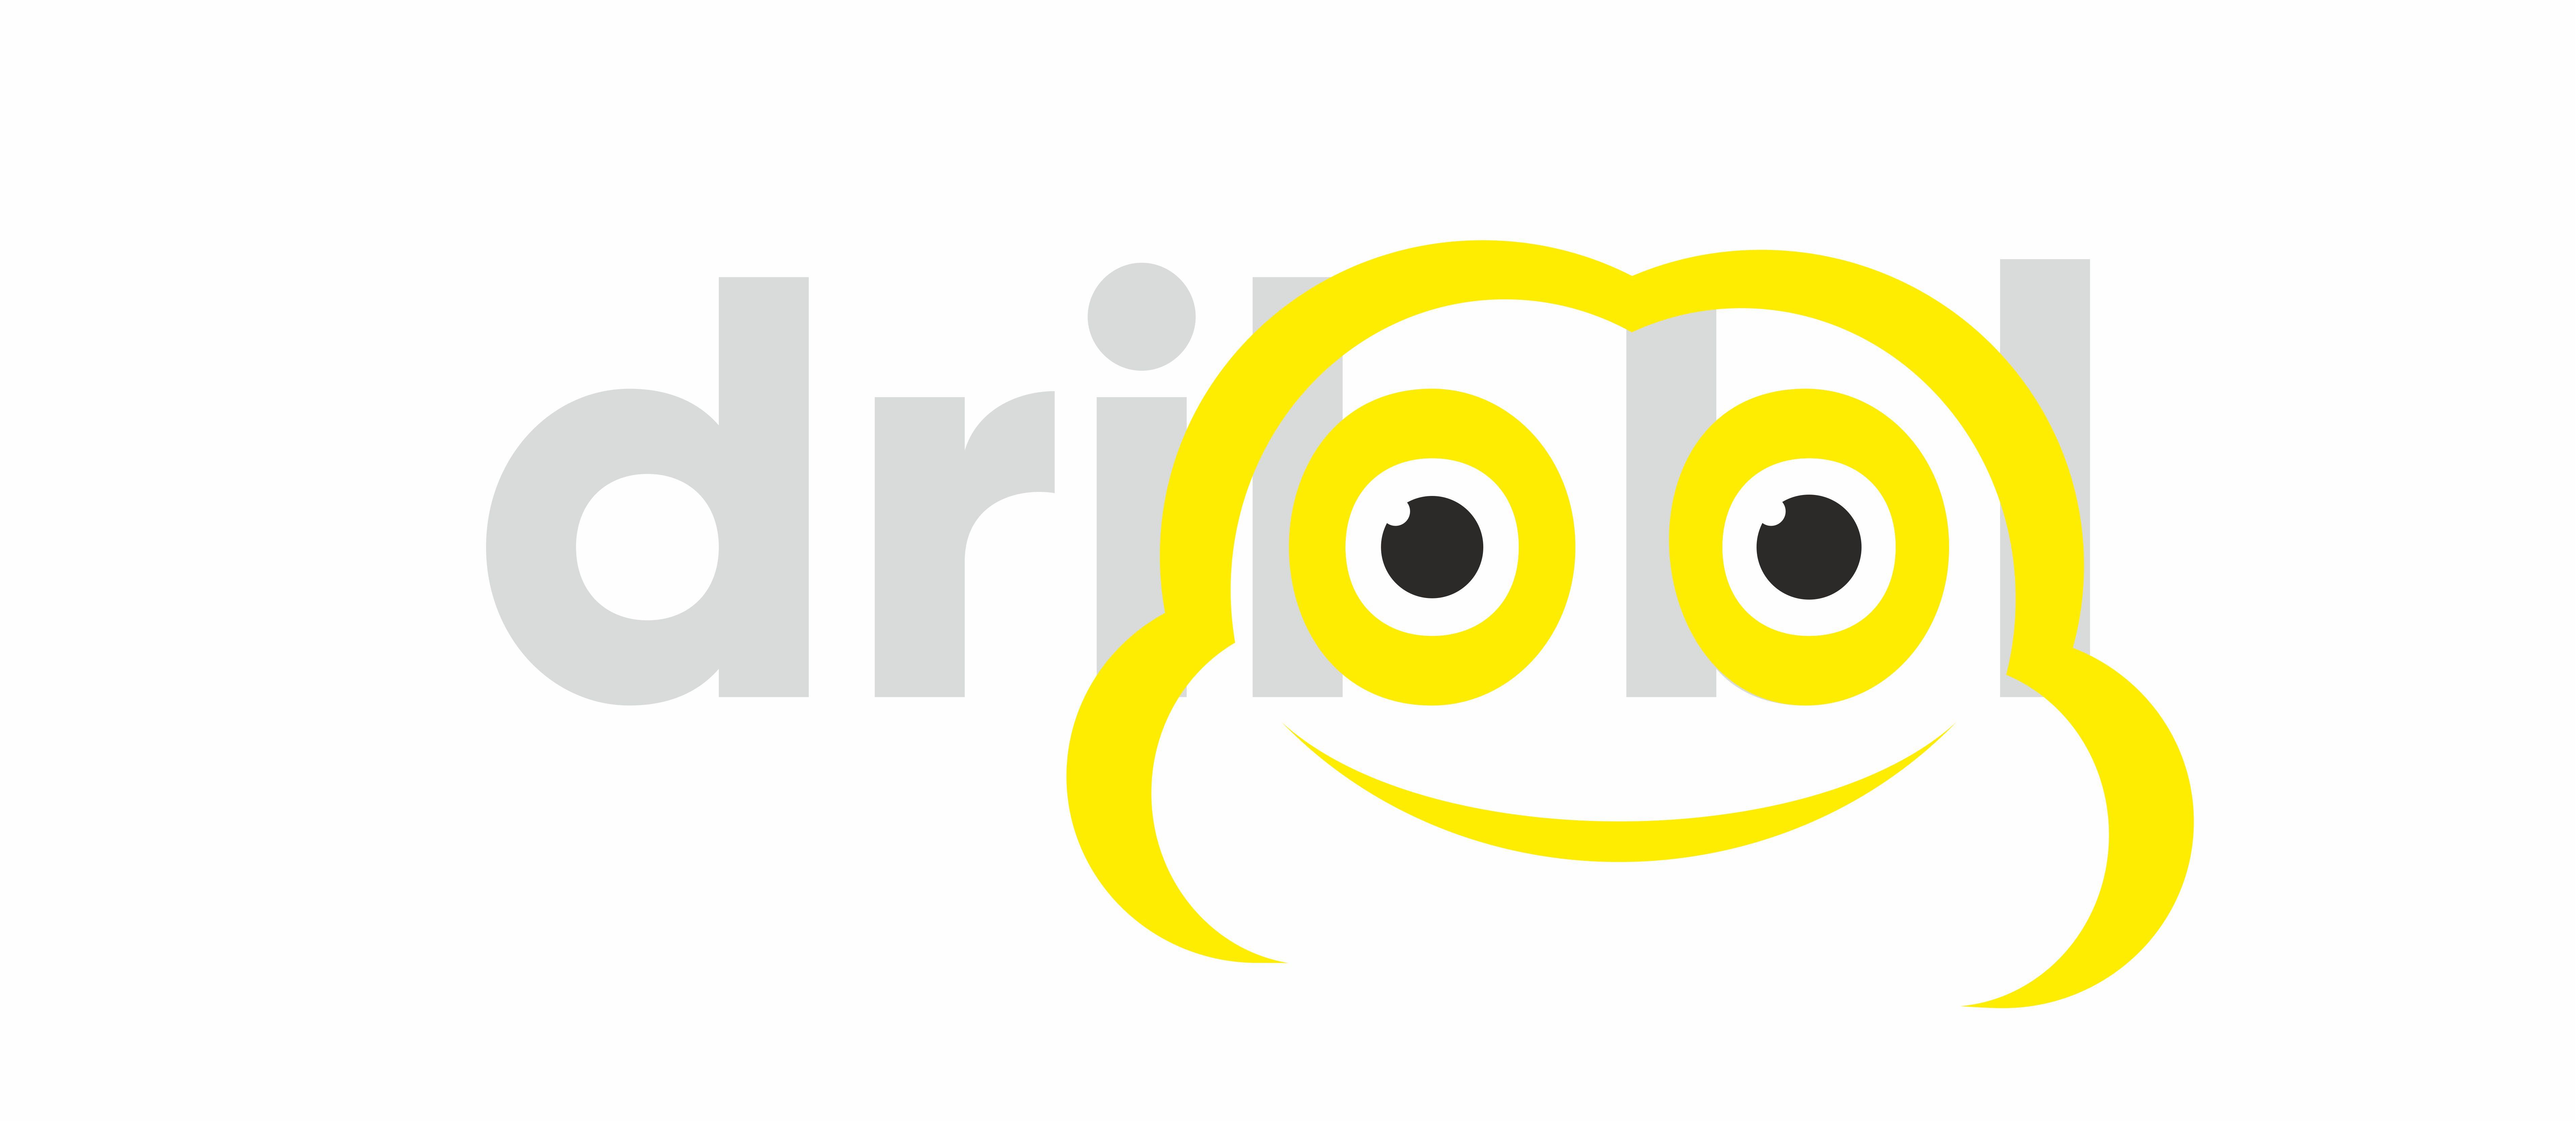 Разработка логотипа для сайта Dribbl.ru фото f_3065a9ba1d049dcb.jpg